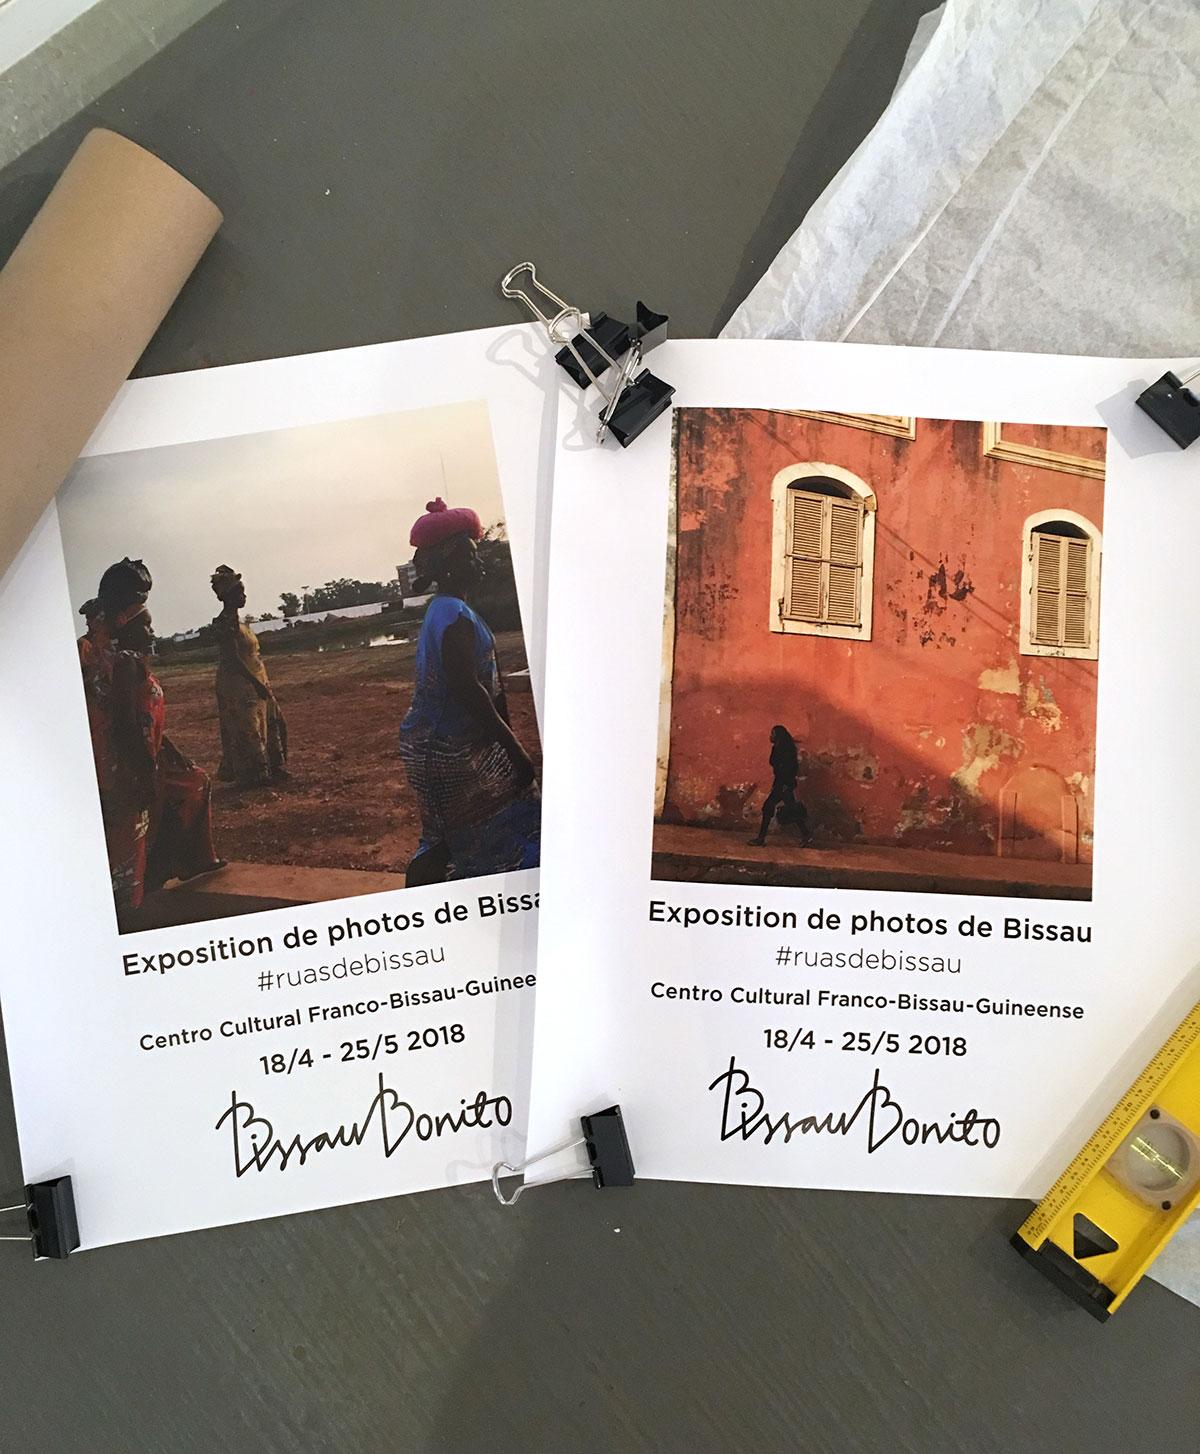 Bissaubonito_01.jpg